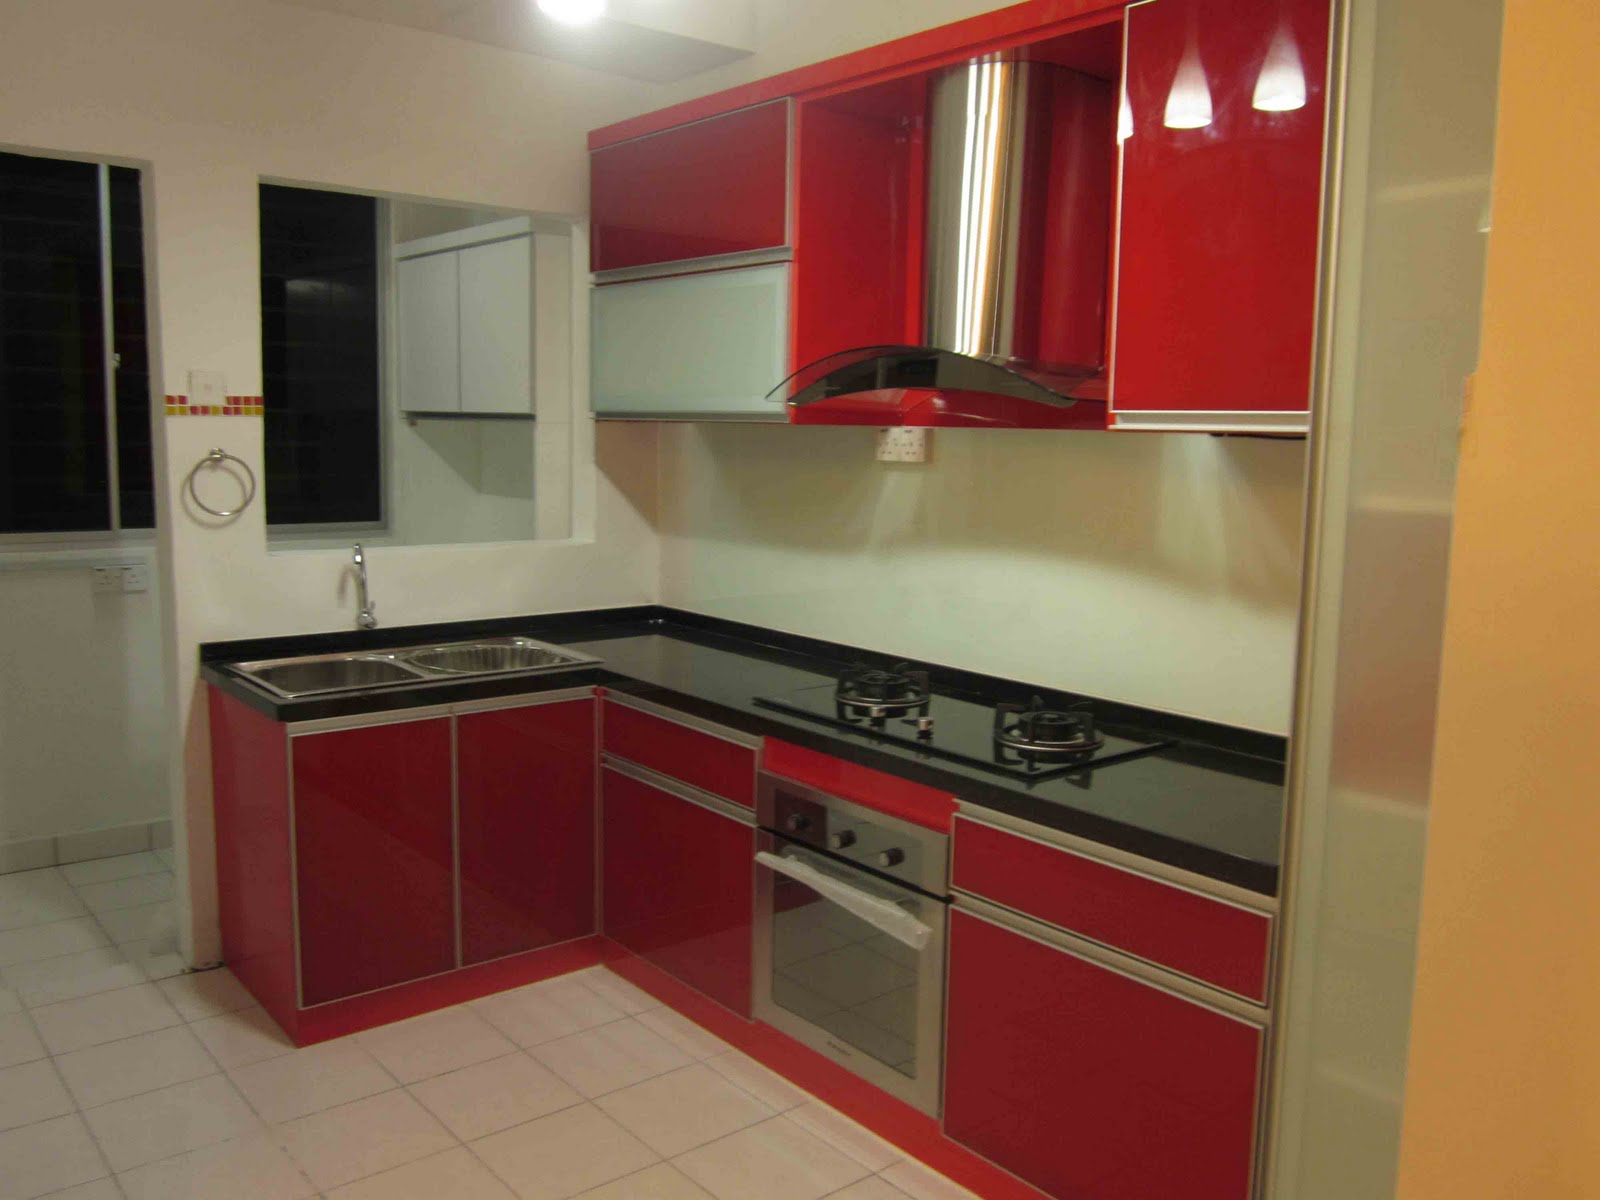 Amazoncom Red  Kitchen Islands amp Carts  Kitchen